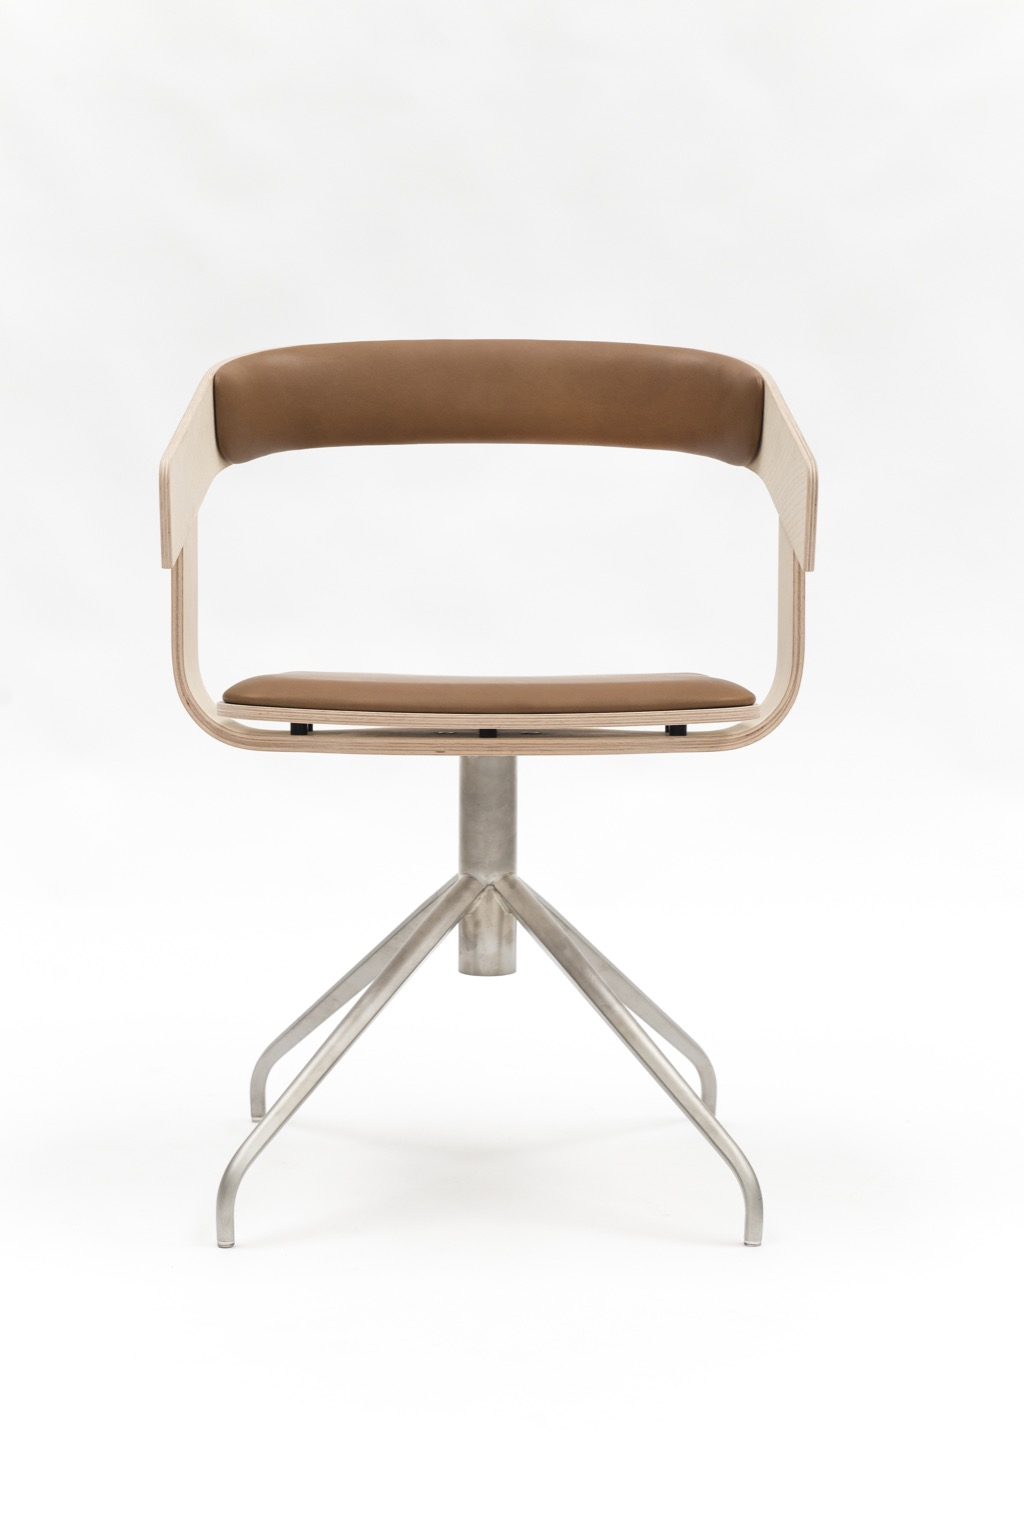 buzzispace buzzifloat office chairs